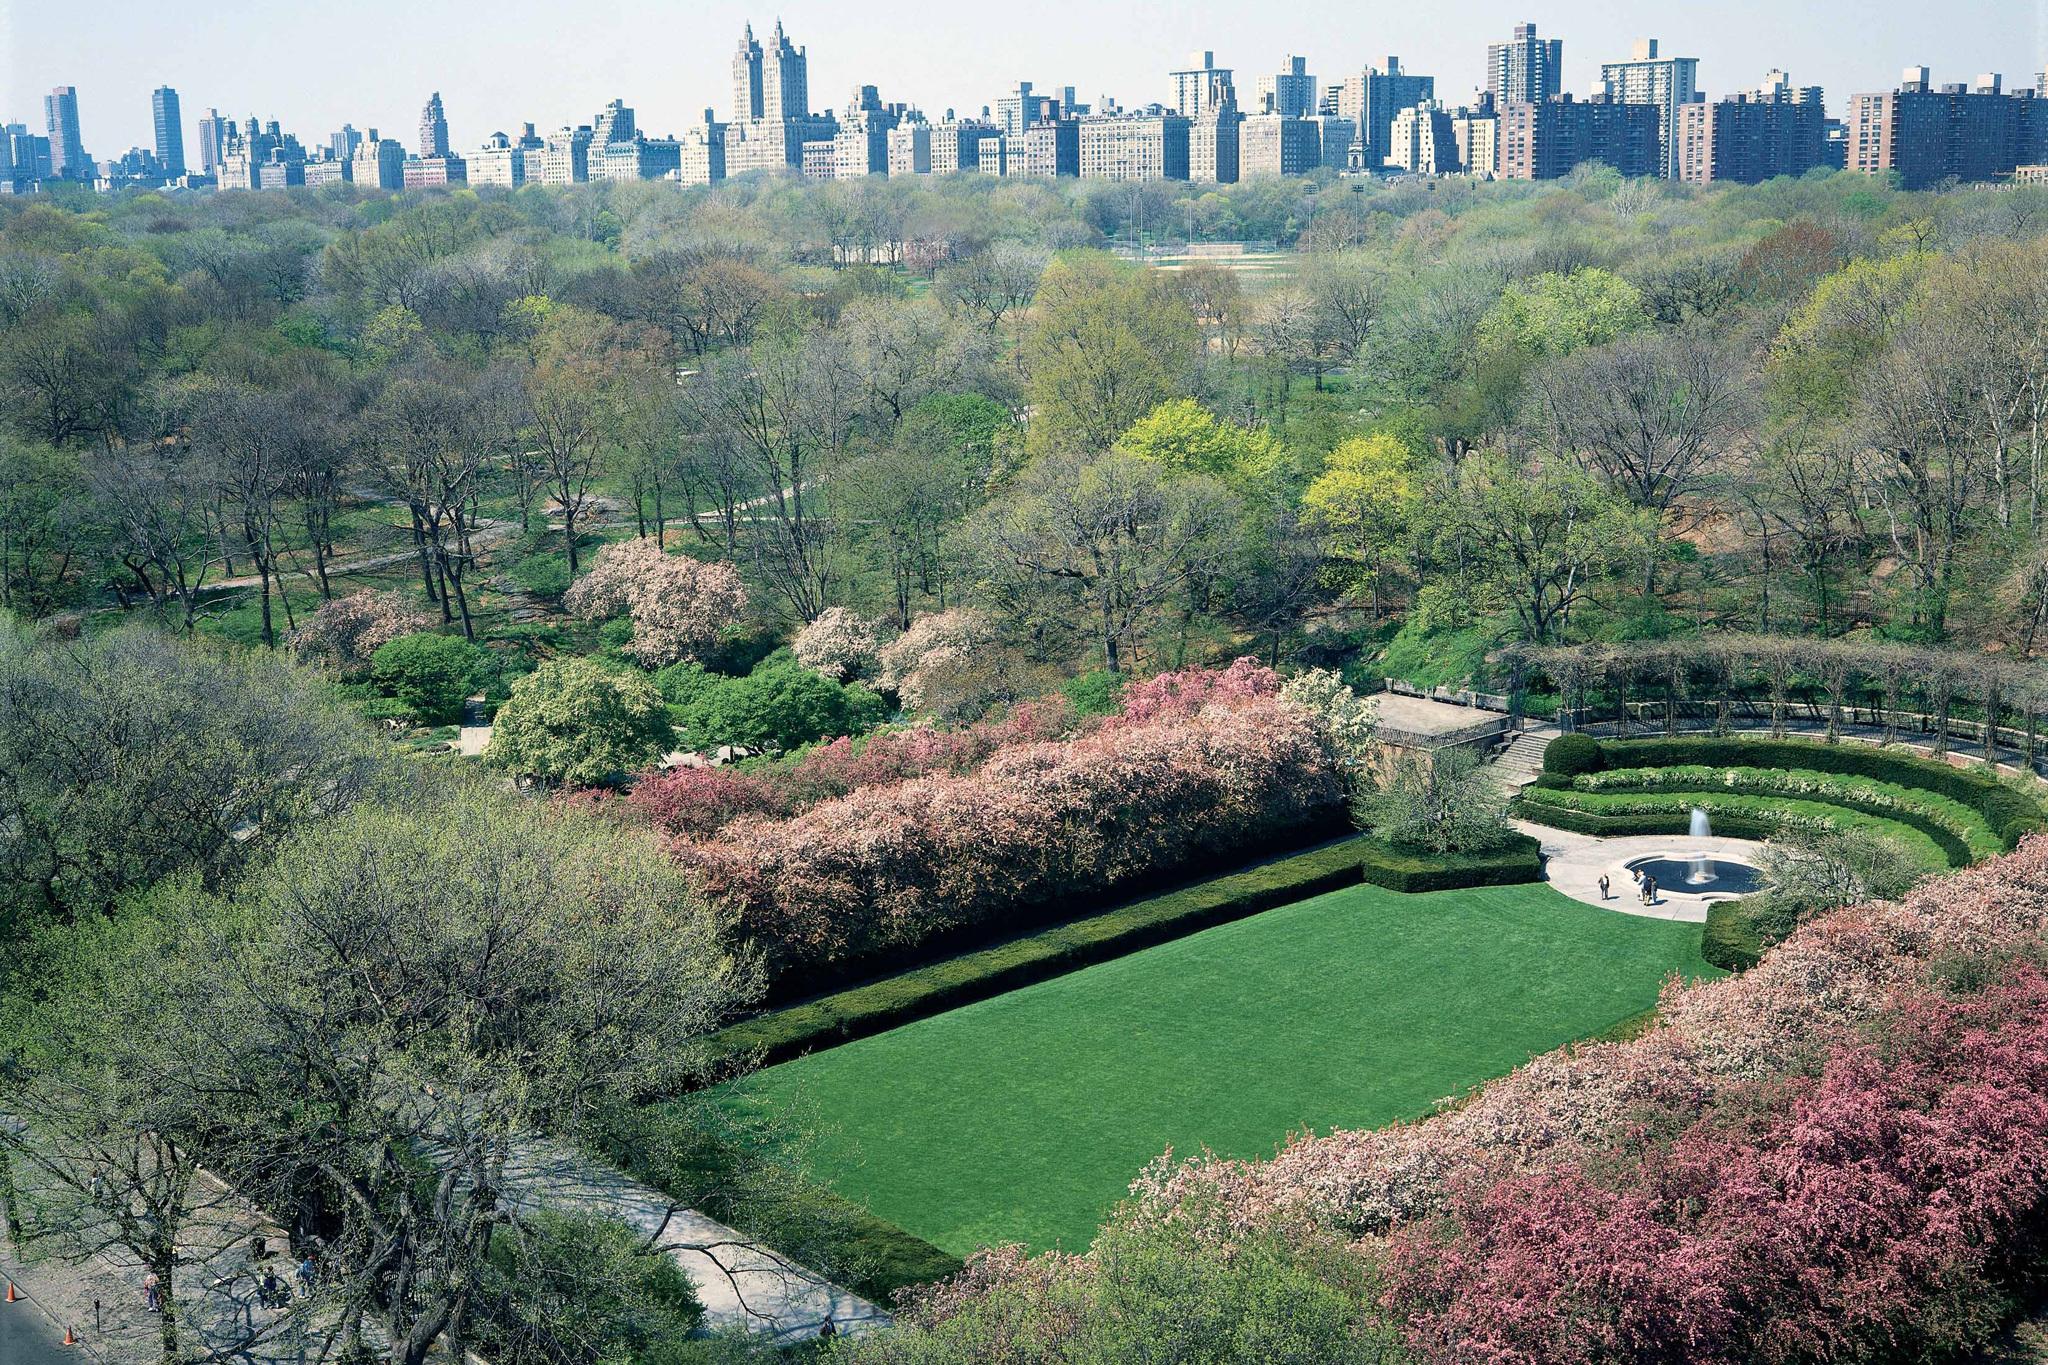 Stroll through Central Park's Conservatory Garden